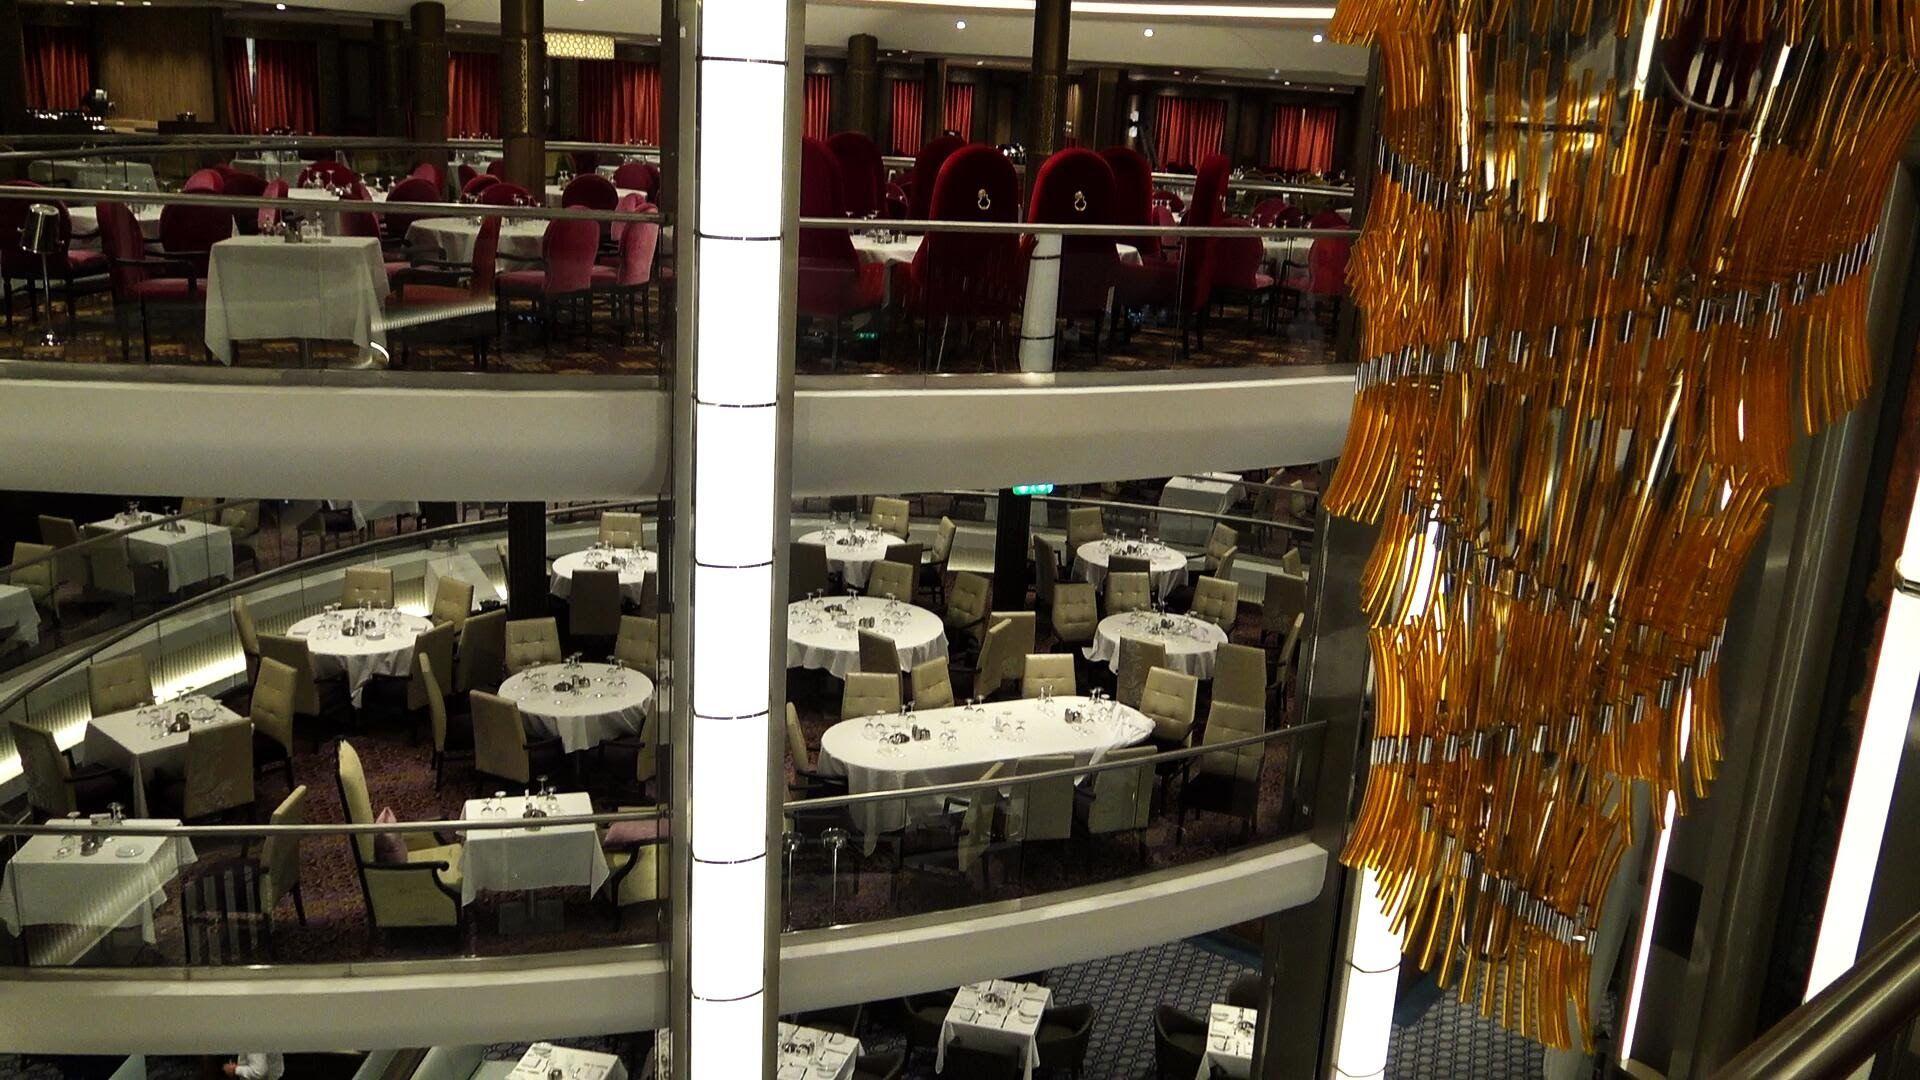 HARMONY OF THE SEAS TOUR MAIN DINING ROOM | Pinterest | Royal ...